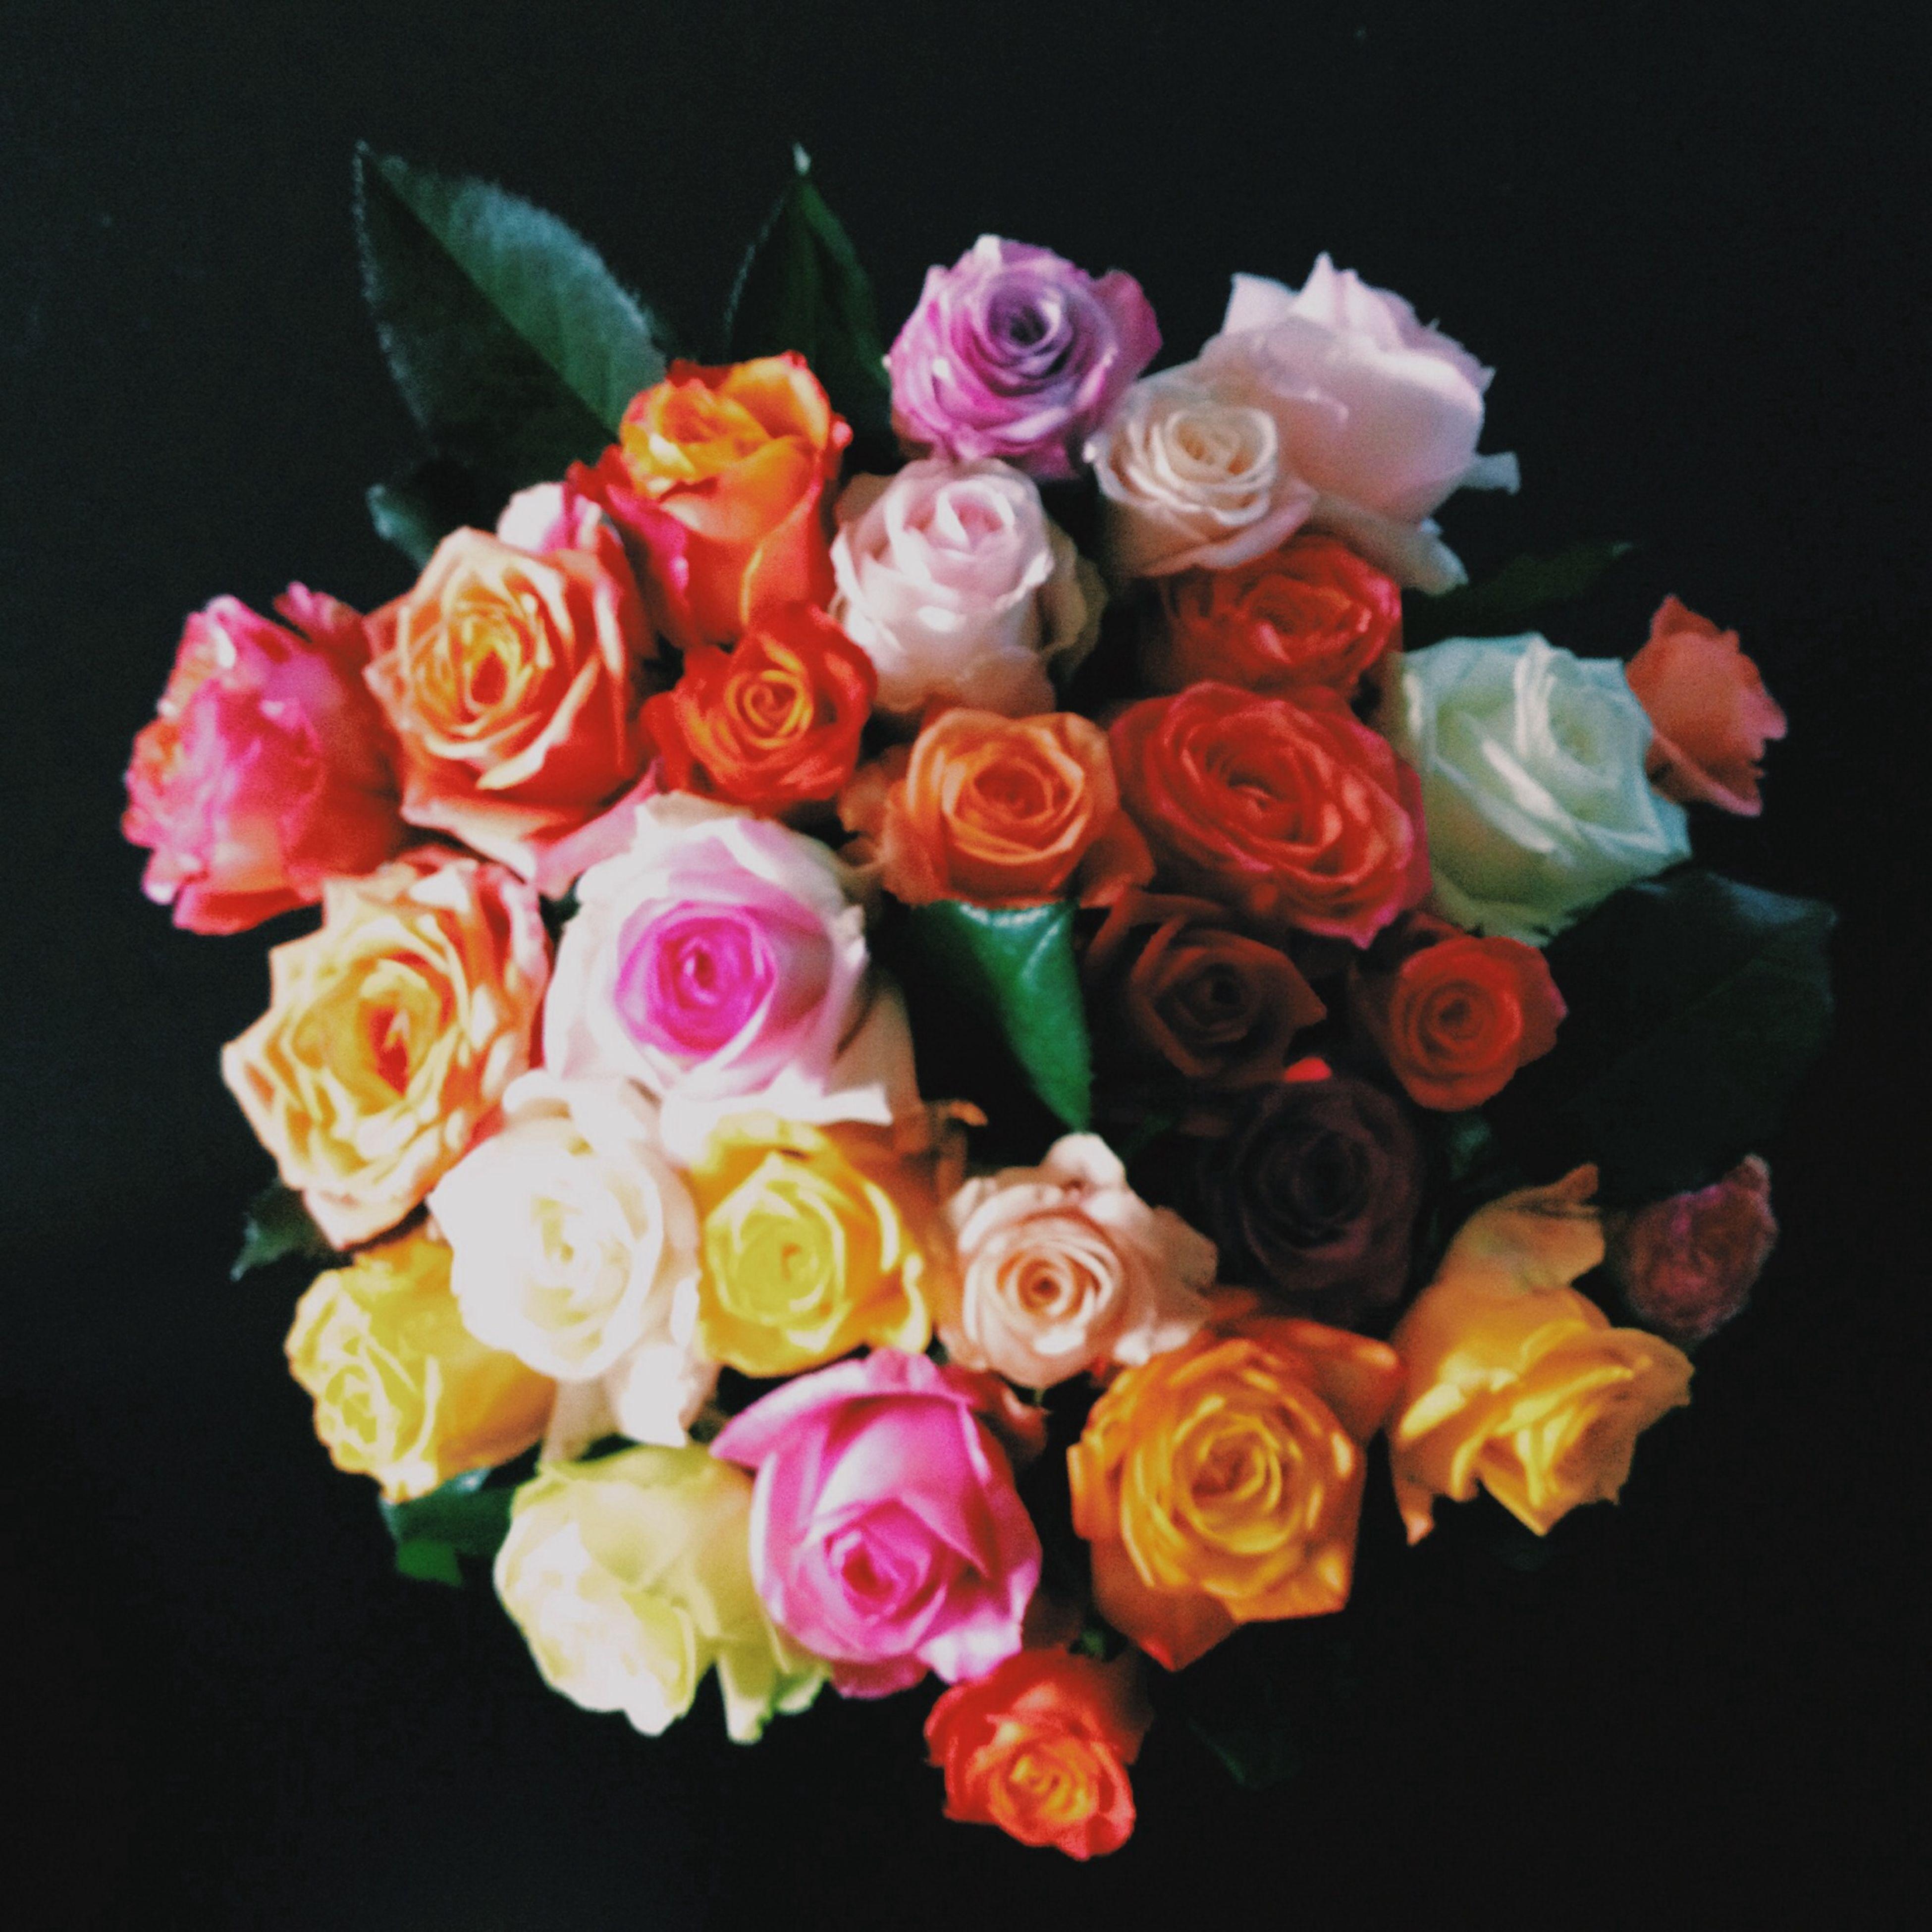 Some Flowers Home Decoration Roses - EyeEm - 웹